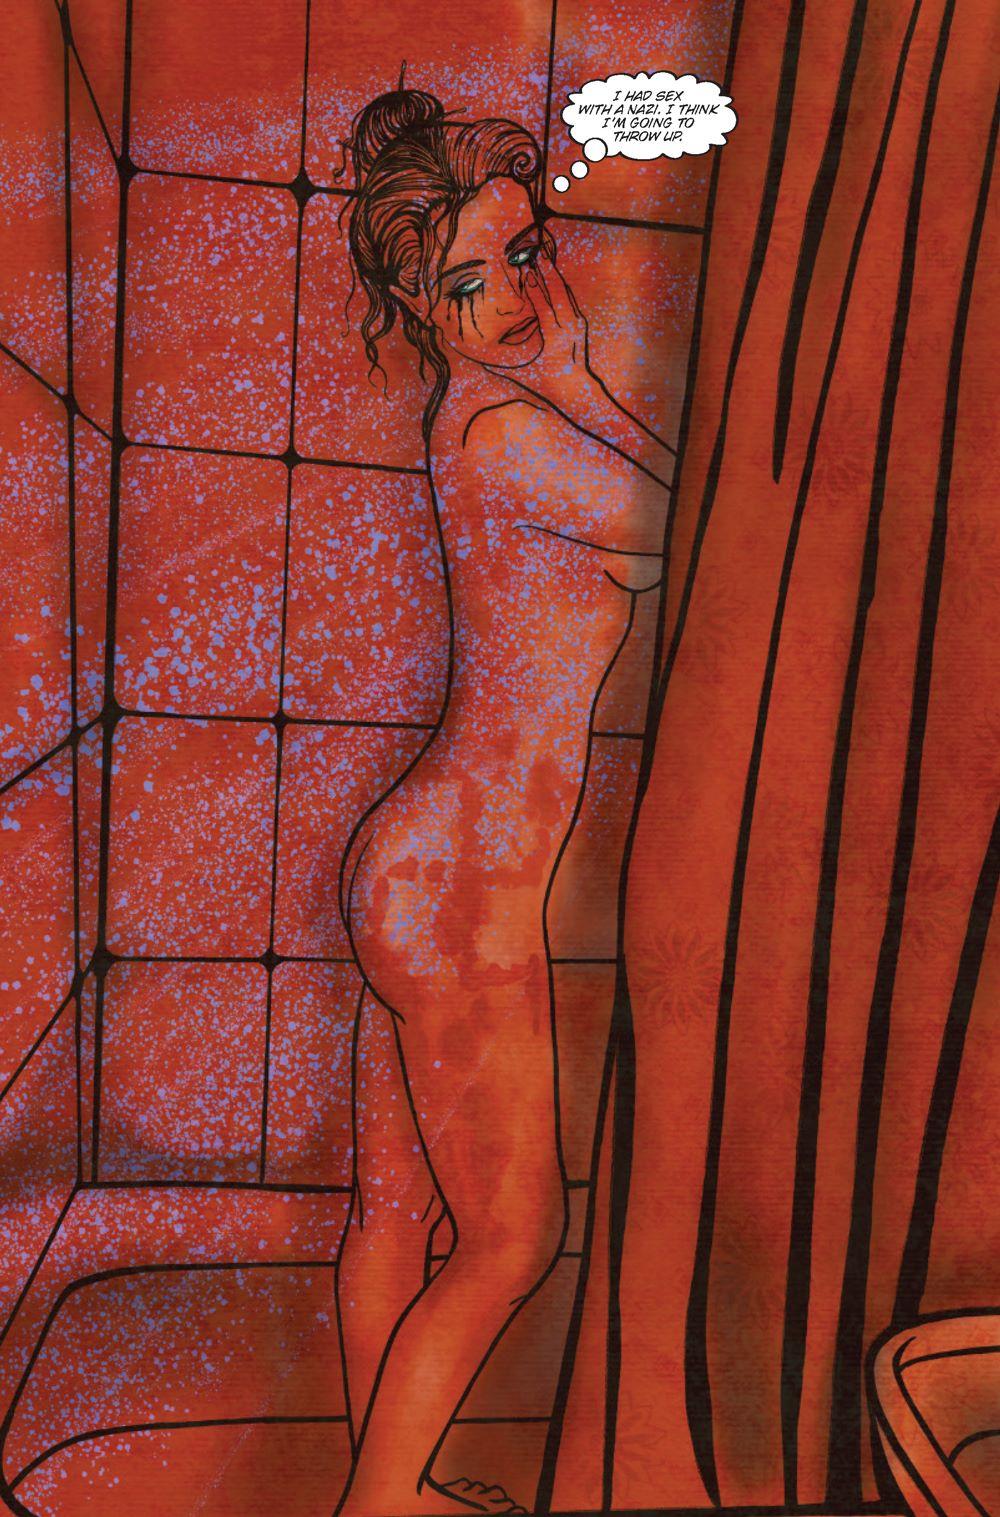 Minky-Woodcock-2-Interiors_Page_2 ComicList Previews: MINKY WOODCOCK THE GIRL WHO ELECTRIFIED TESLA #2